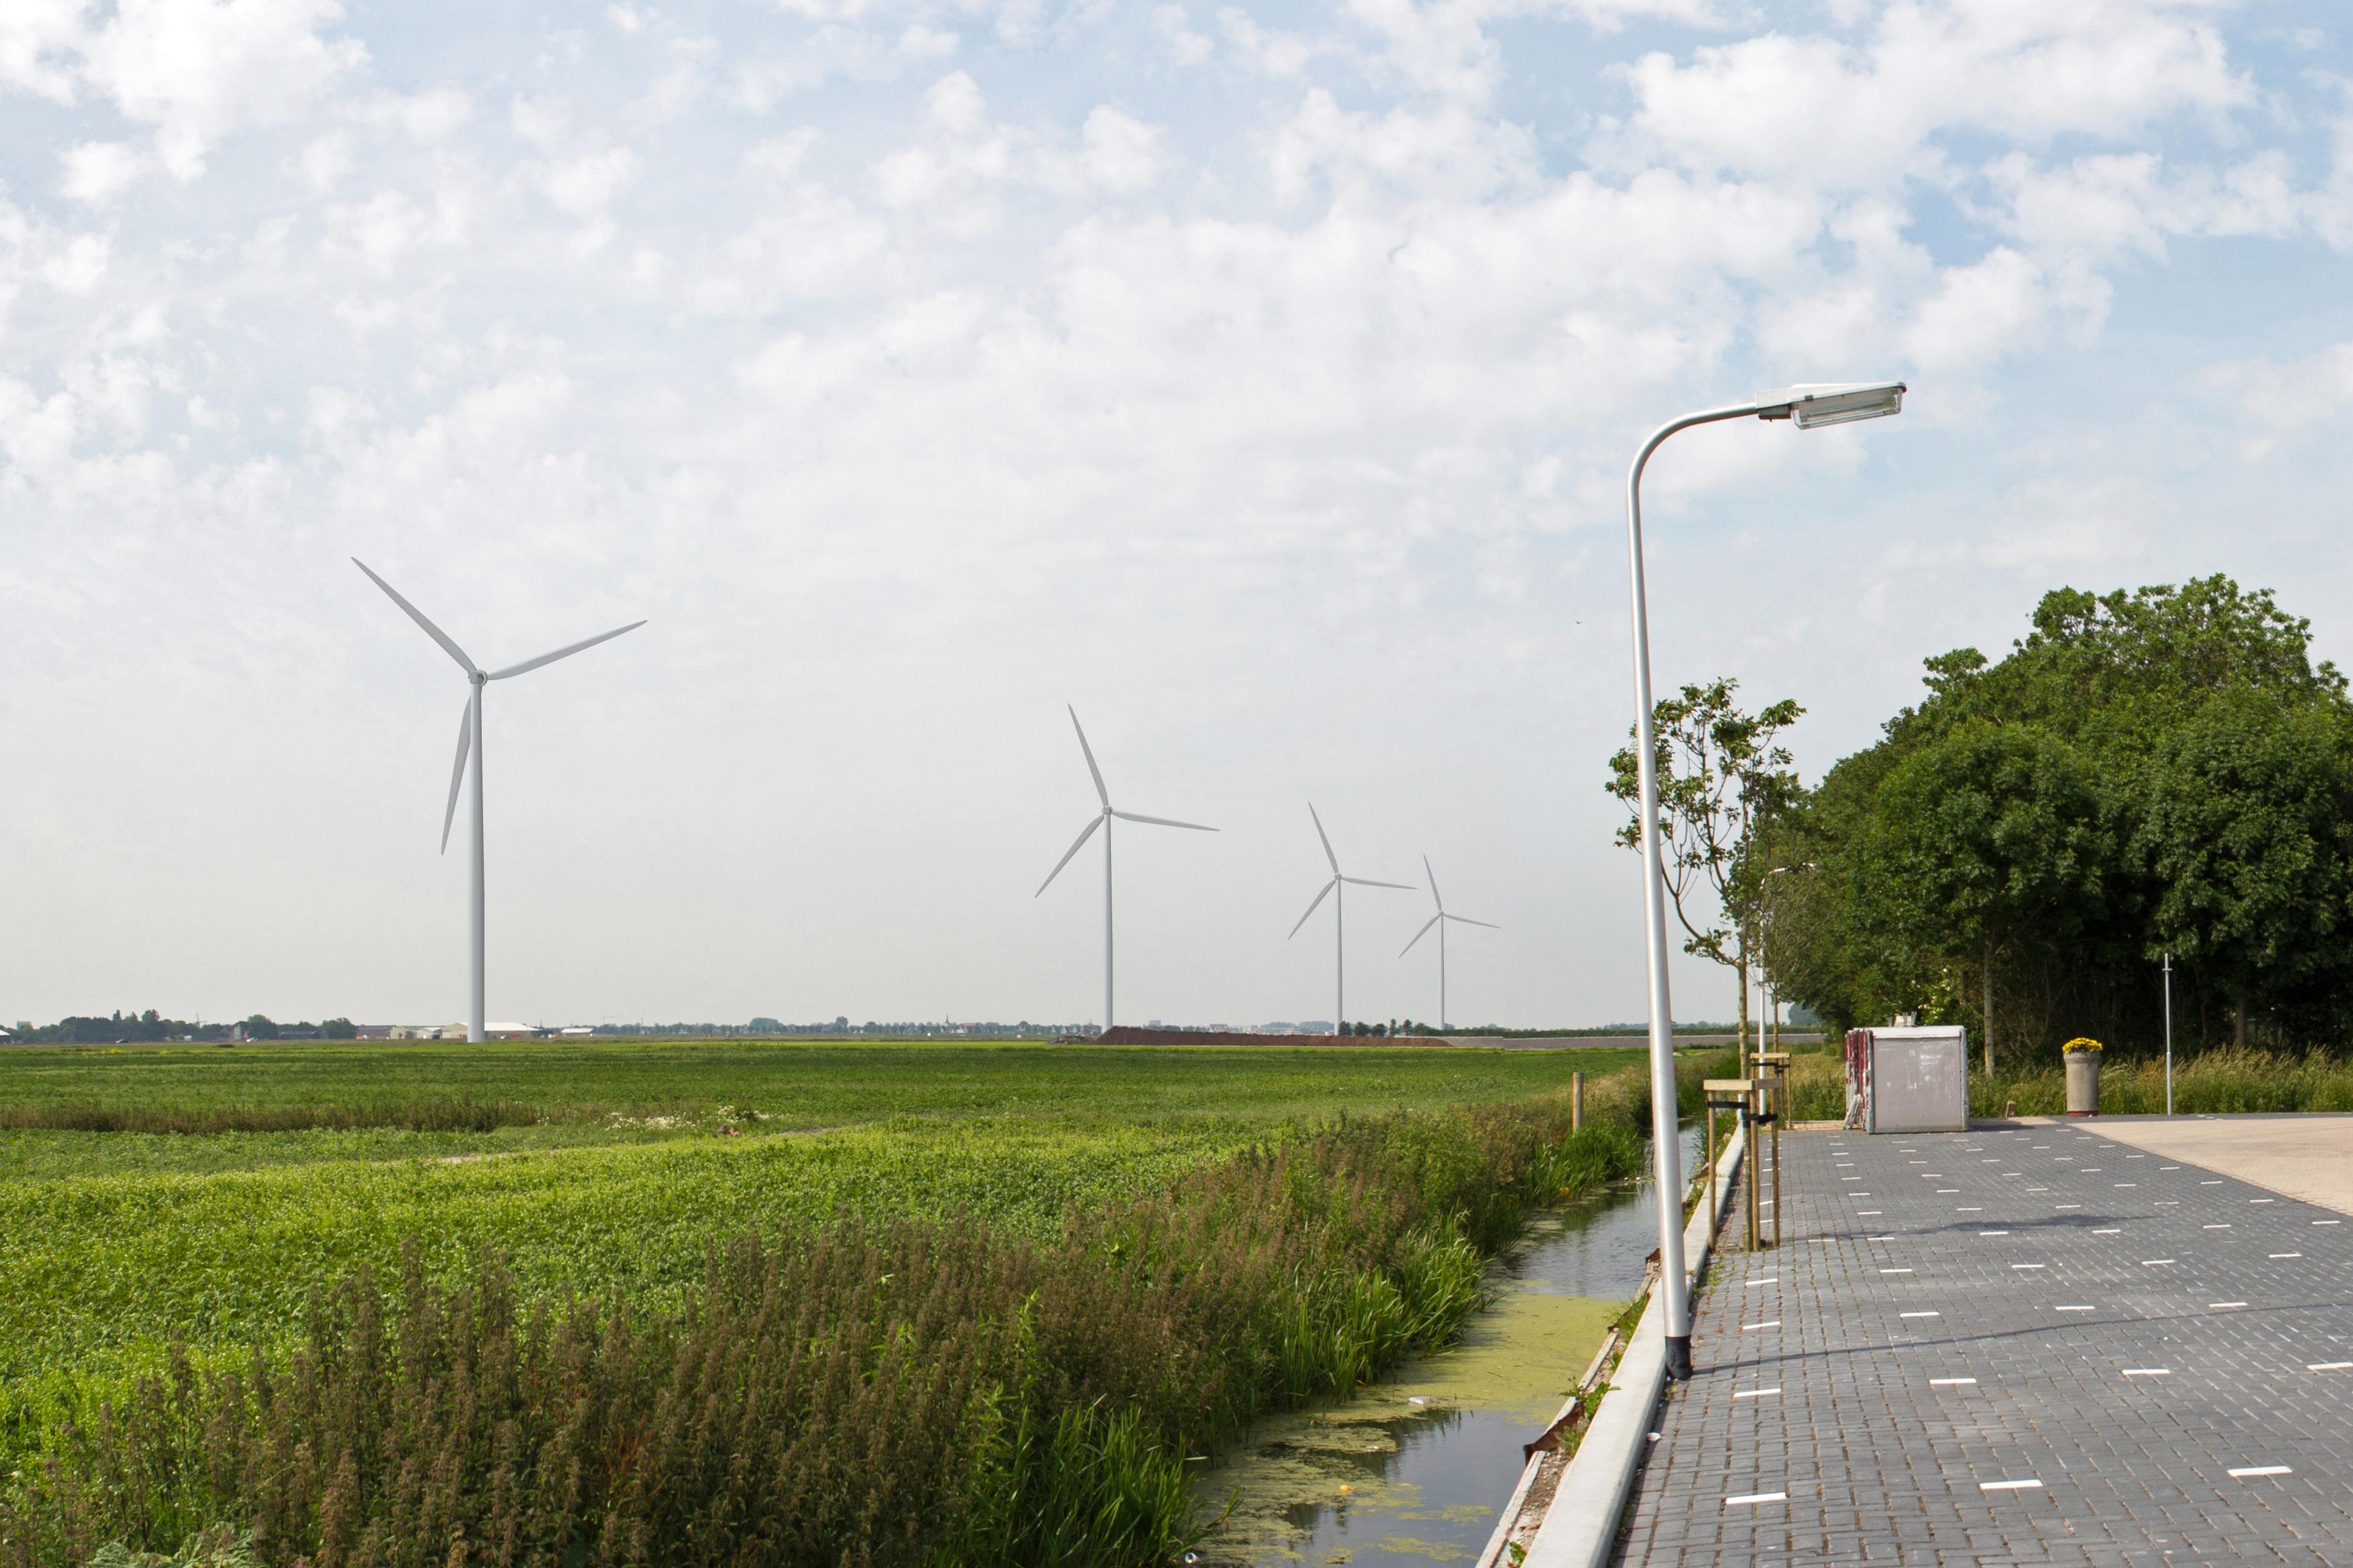 Provinciaal Inpassingsplan windpark Westfrisia vastgesteld